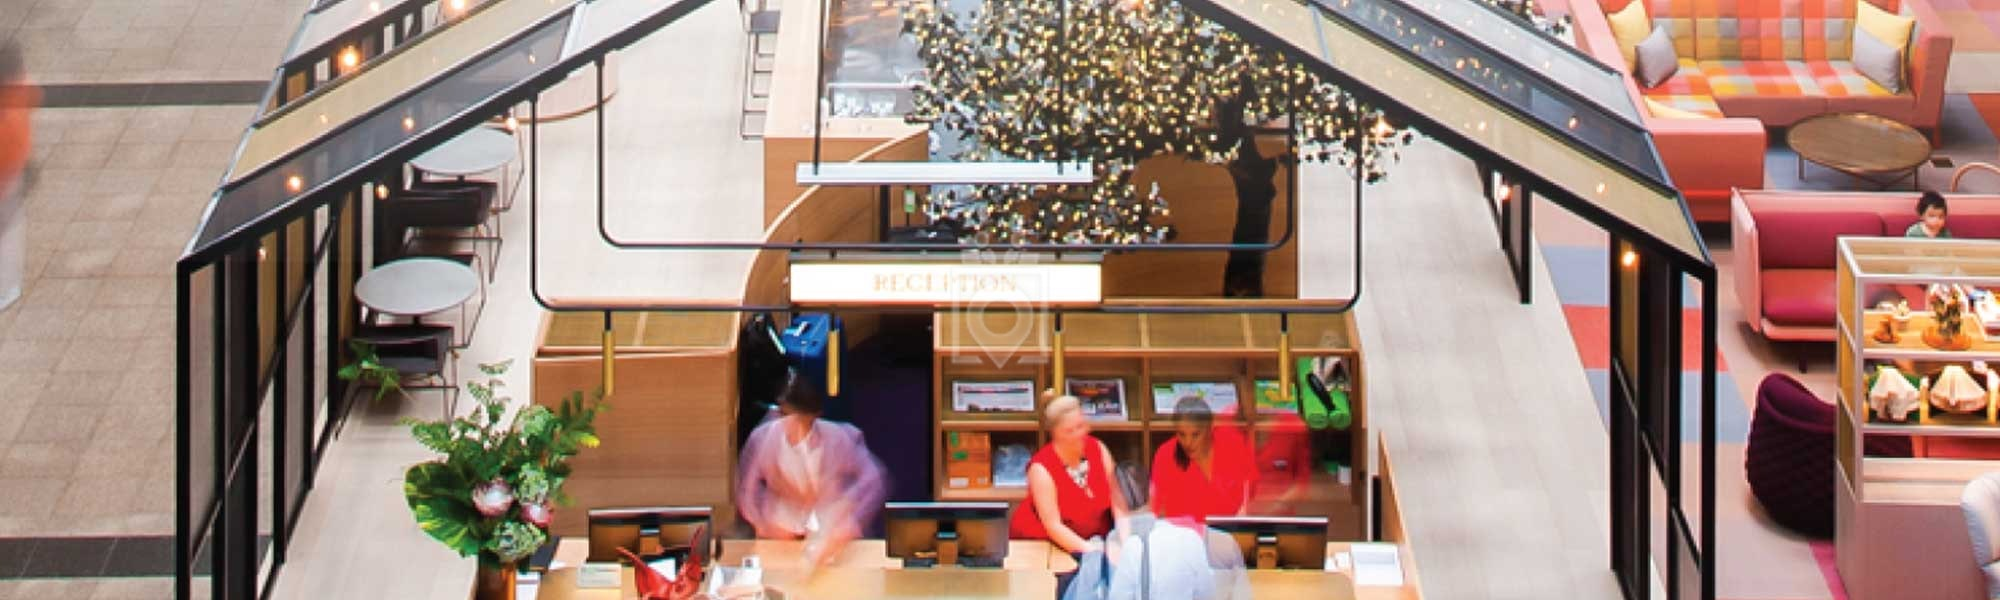 TwoSpace at Ovolo Woolloomooloo, Sydney